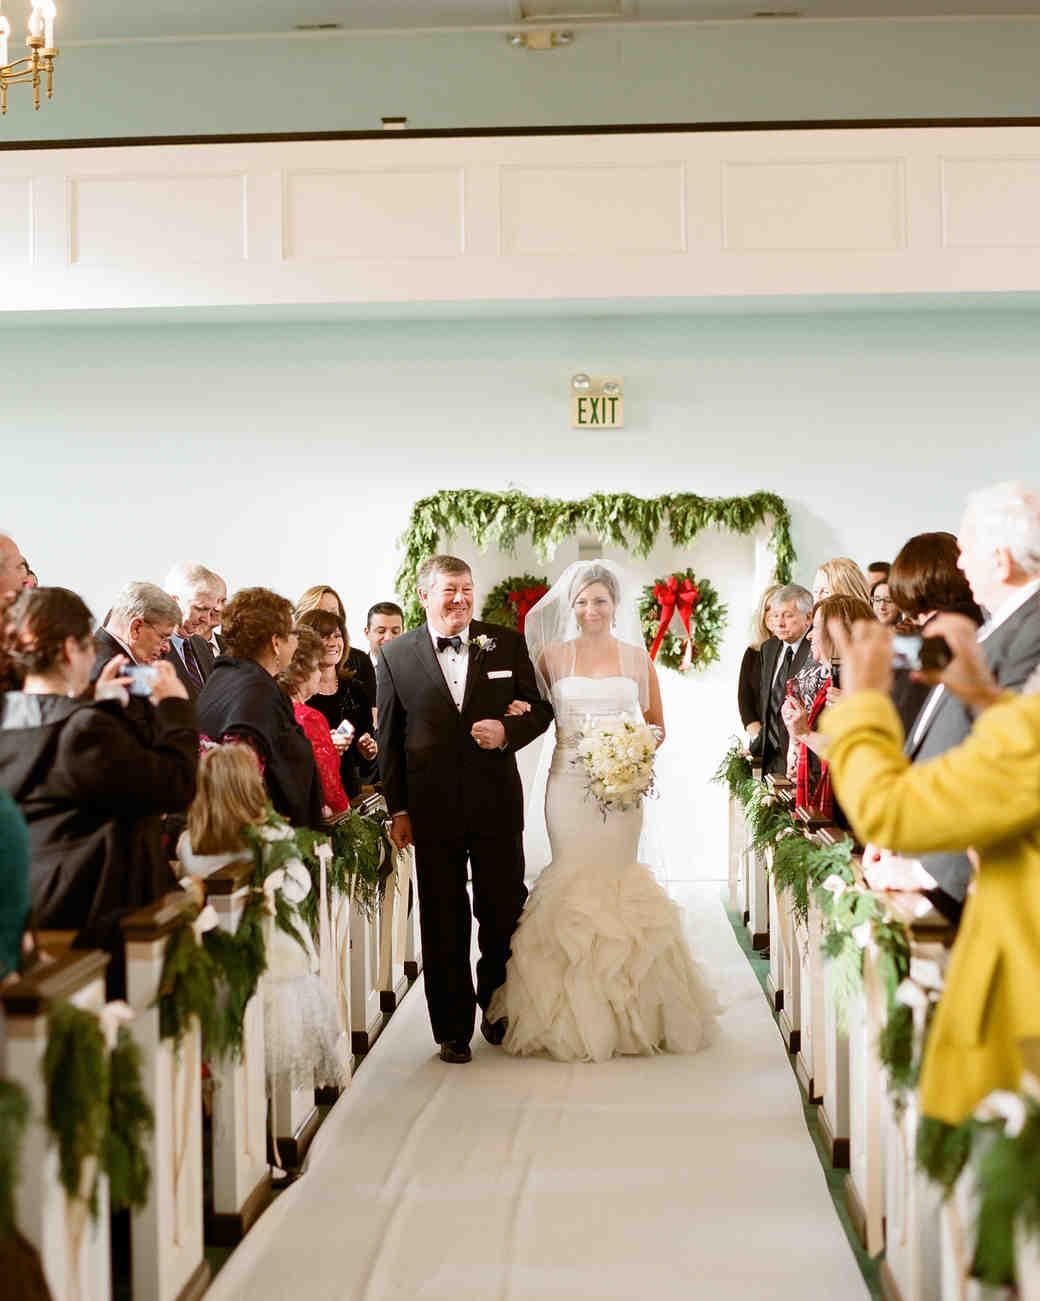 paige-michael-wedding-entrance-0681-s112431-1215.jpg